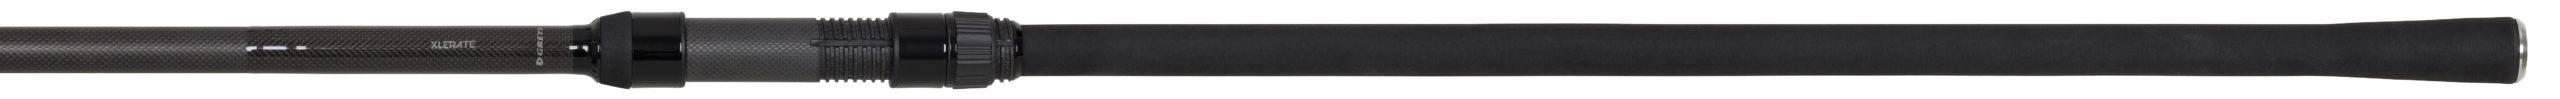 Greys Xlerate Slim Cork Carp Rod Karpfenrute mit durchgehendem Kork Griff 1